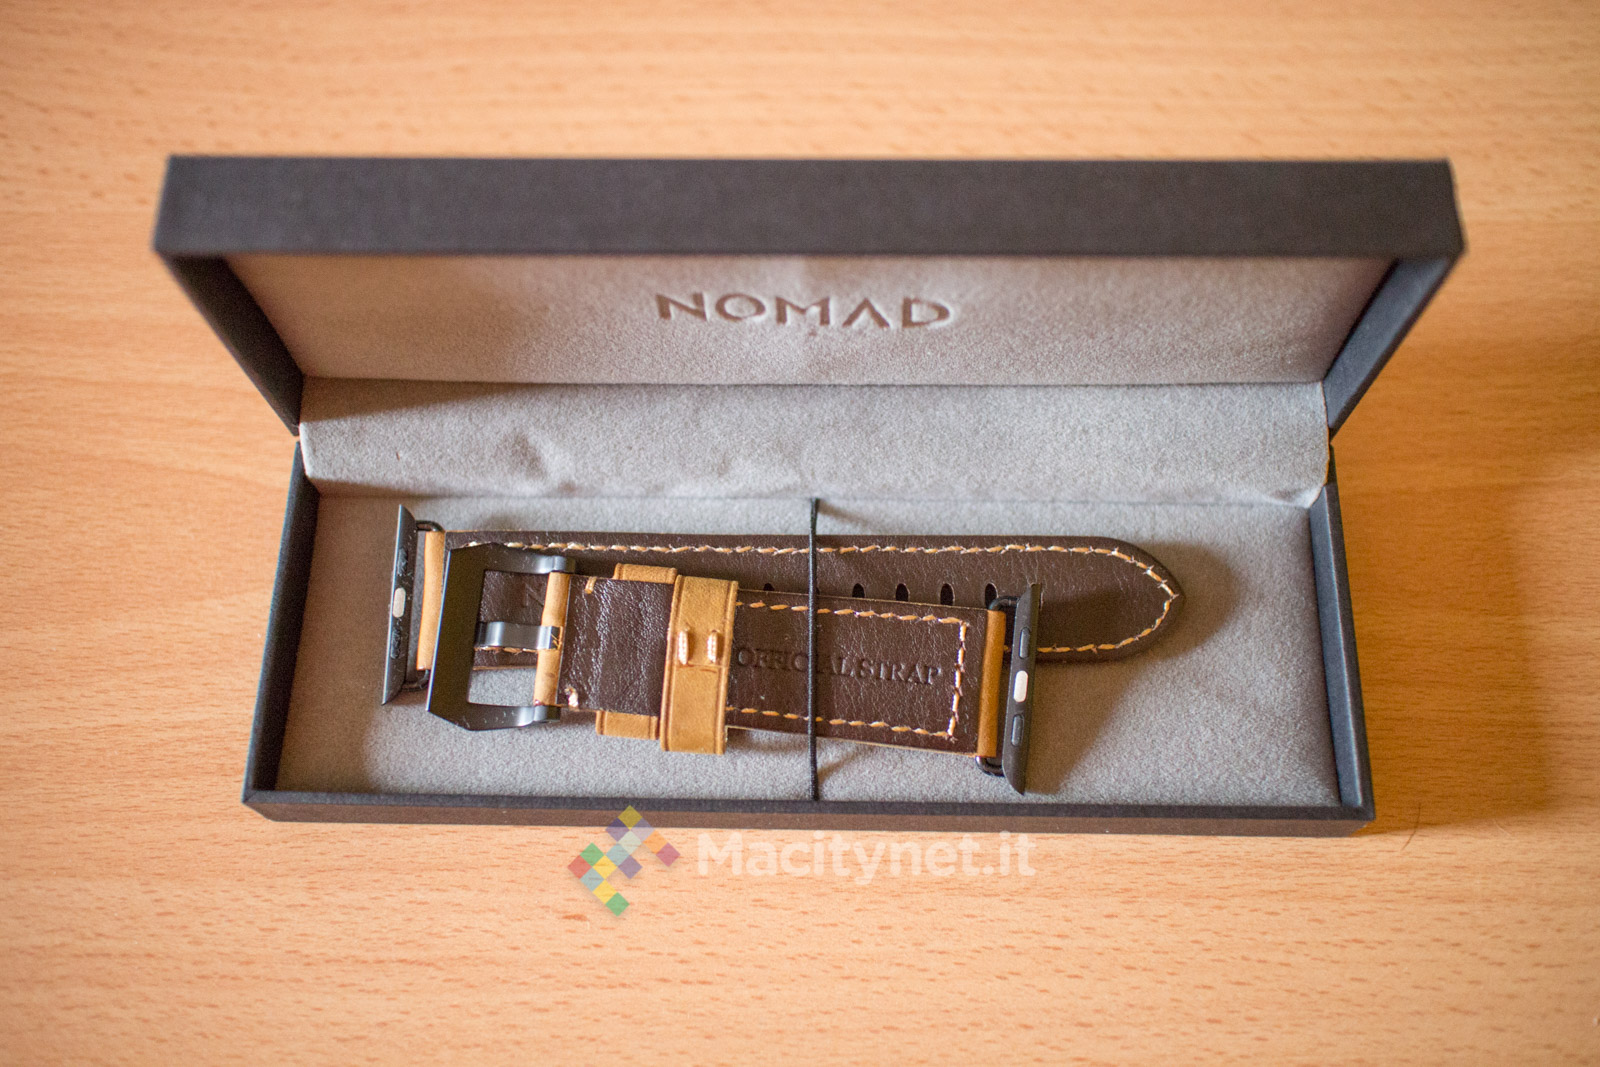 Recensione Nomad Strap